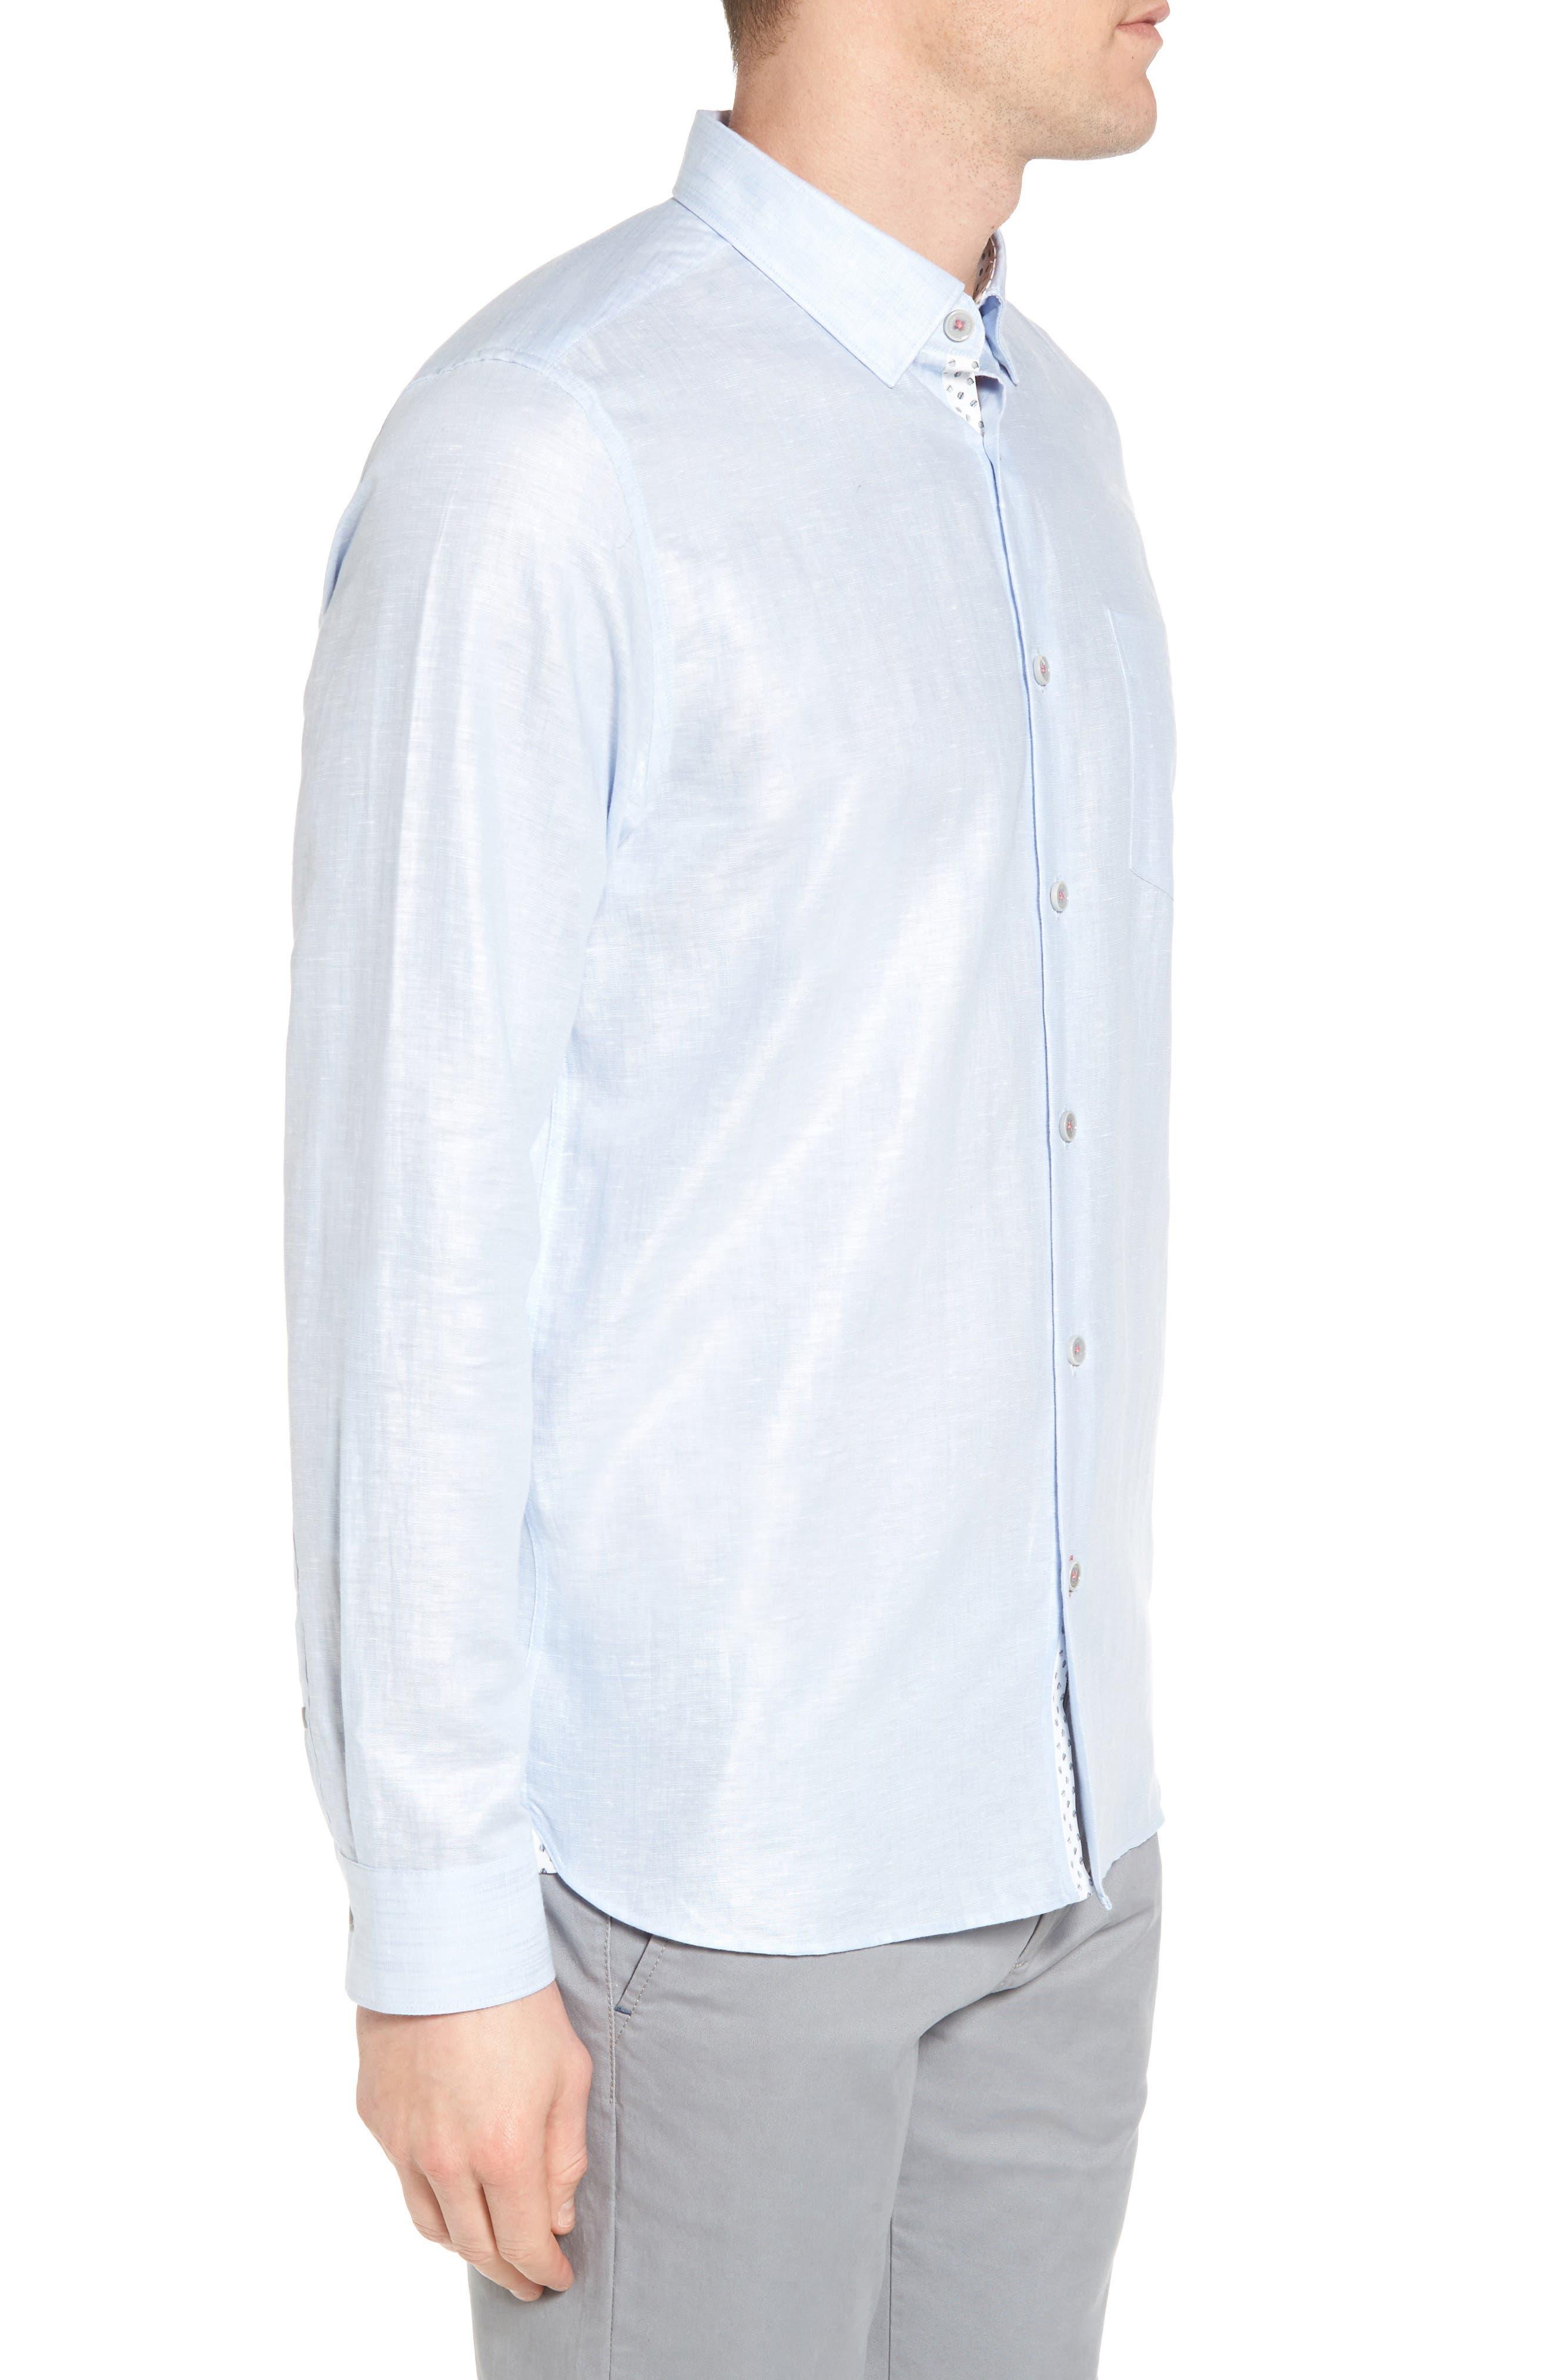 Linlins Herringbone Cotton & Linen Sport Shirt,                             Alternate thumbnail 13, color,